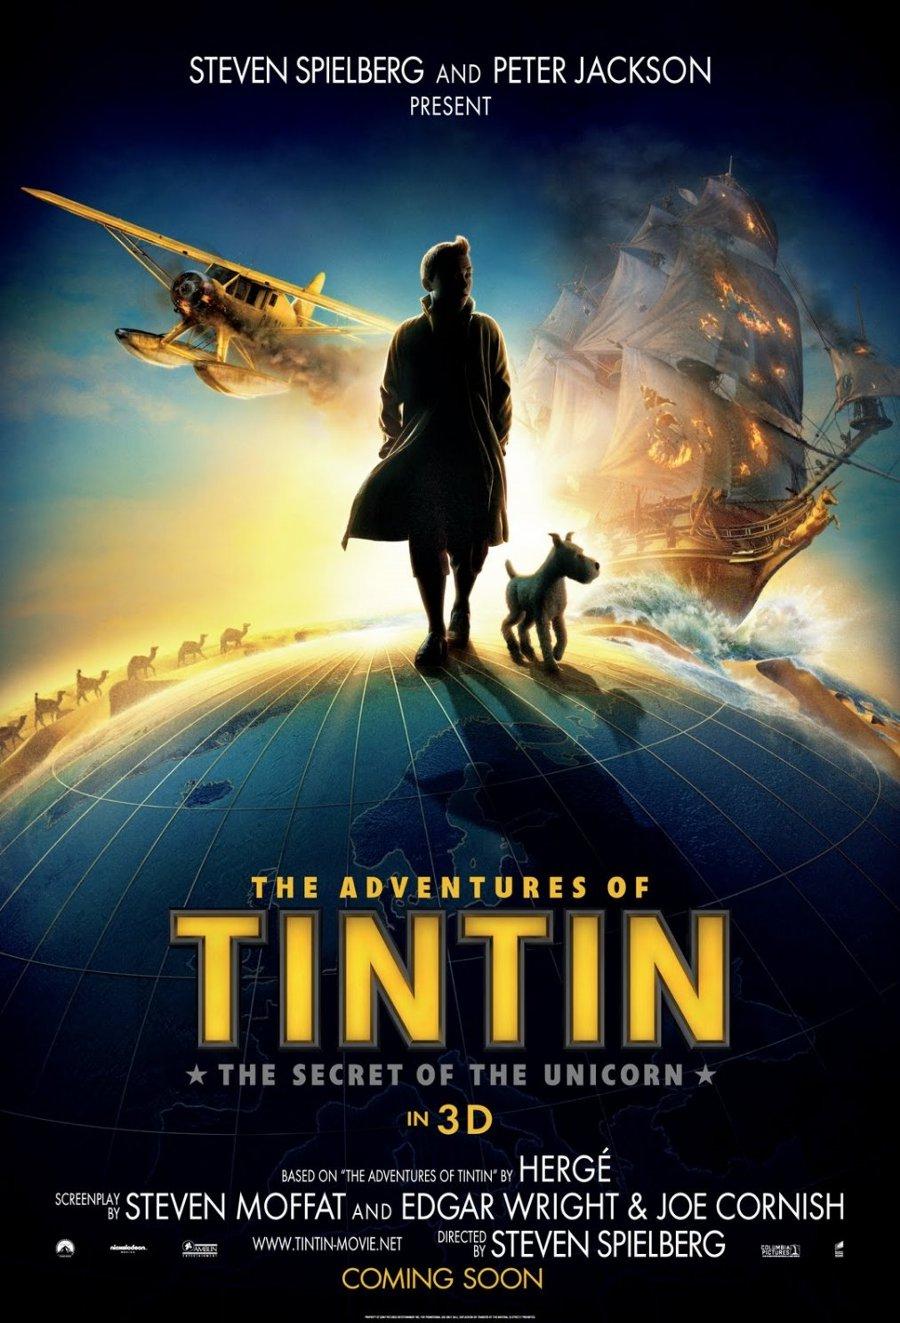 Приключения тинтина тайна единорога 2 14 фотография